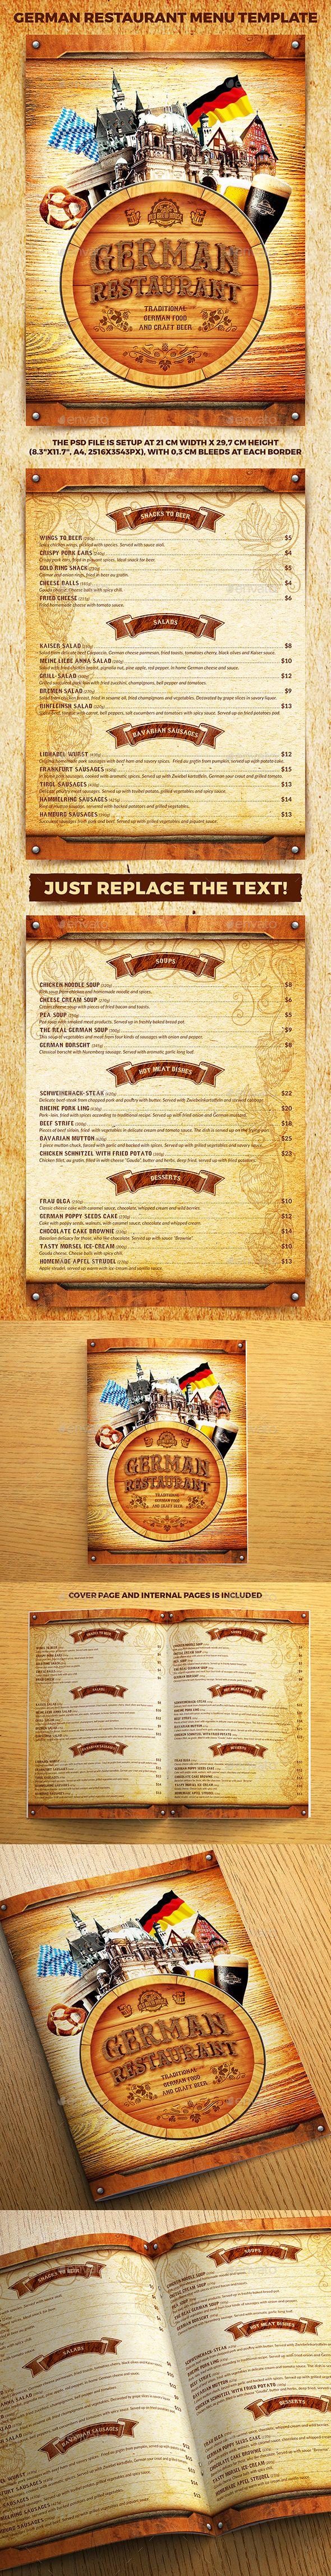 "German Restaurant Menu Template ¡°German Restaurant Menu Template"" suitable for any German/Bavarian/ Beer cafe/restaurant business"